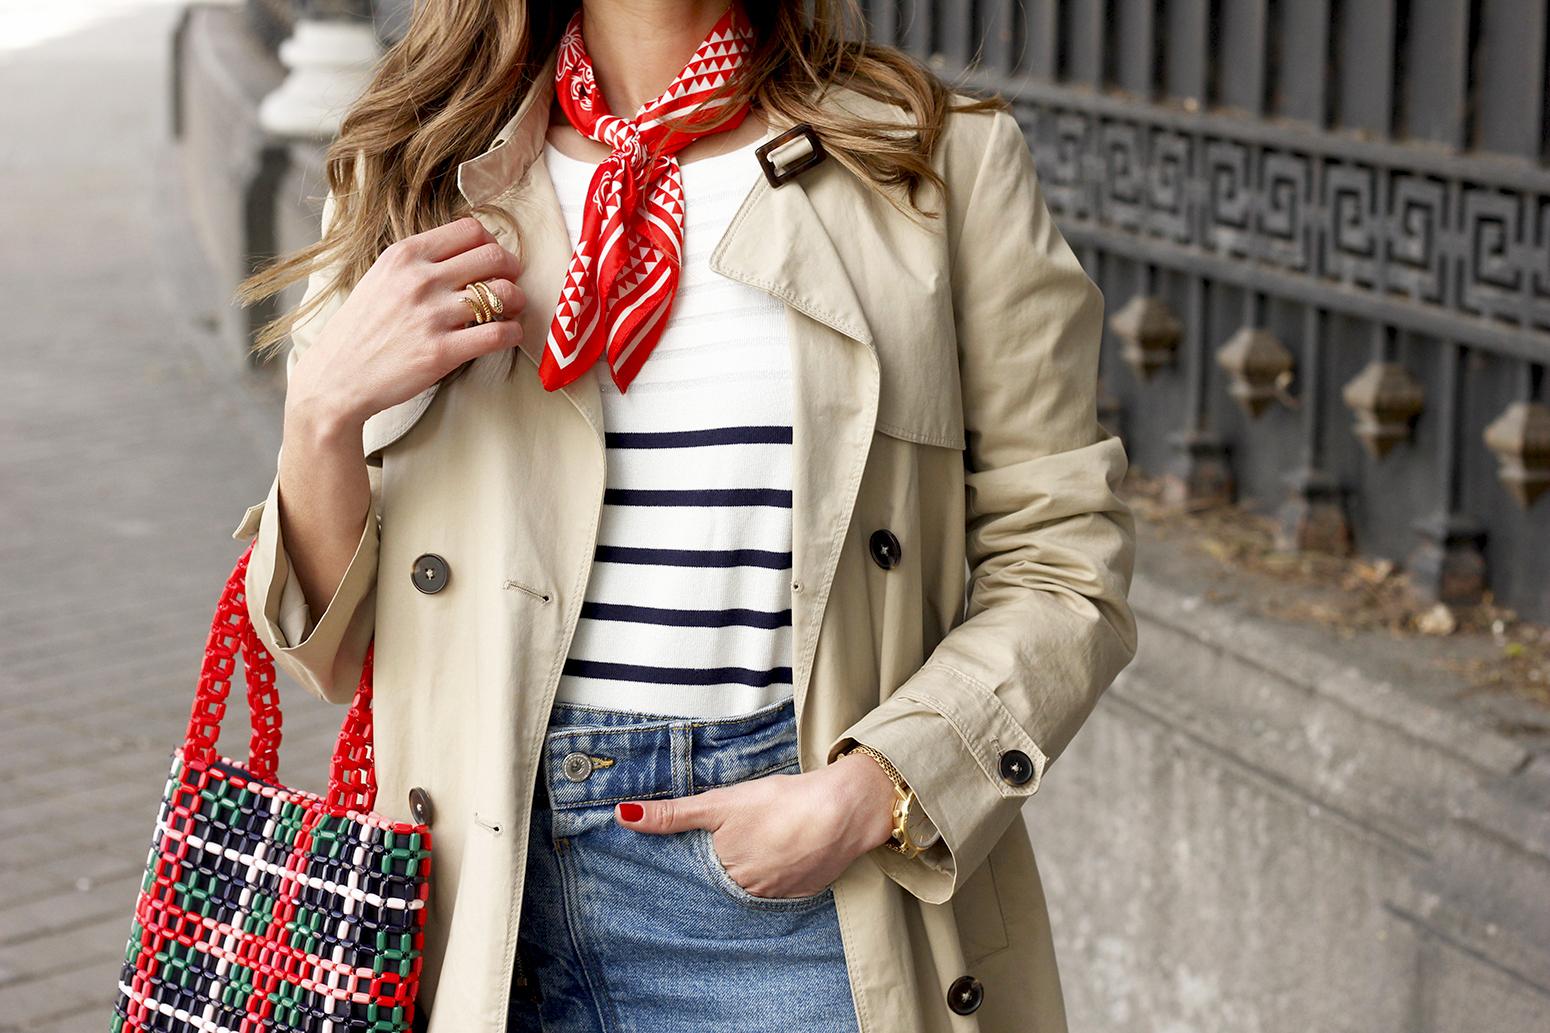 trench outfit denim skirt kitten heels striped sweater spring 14